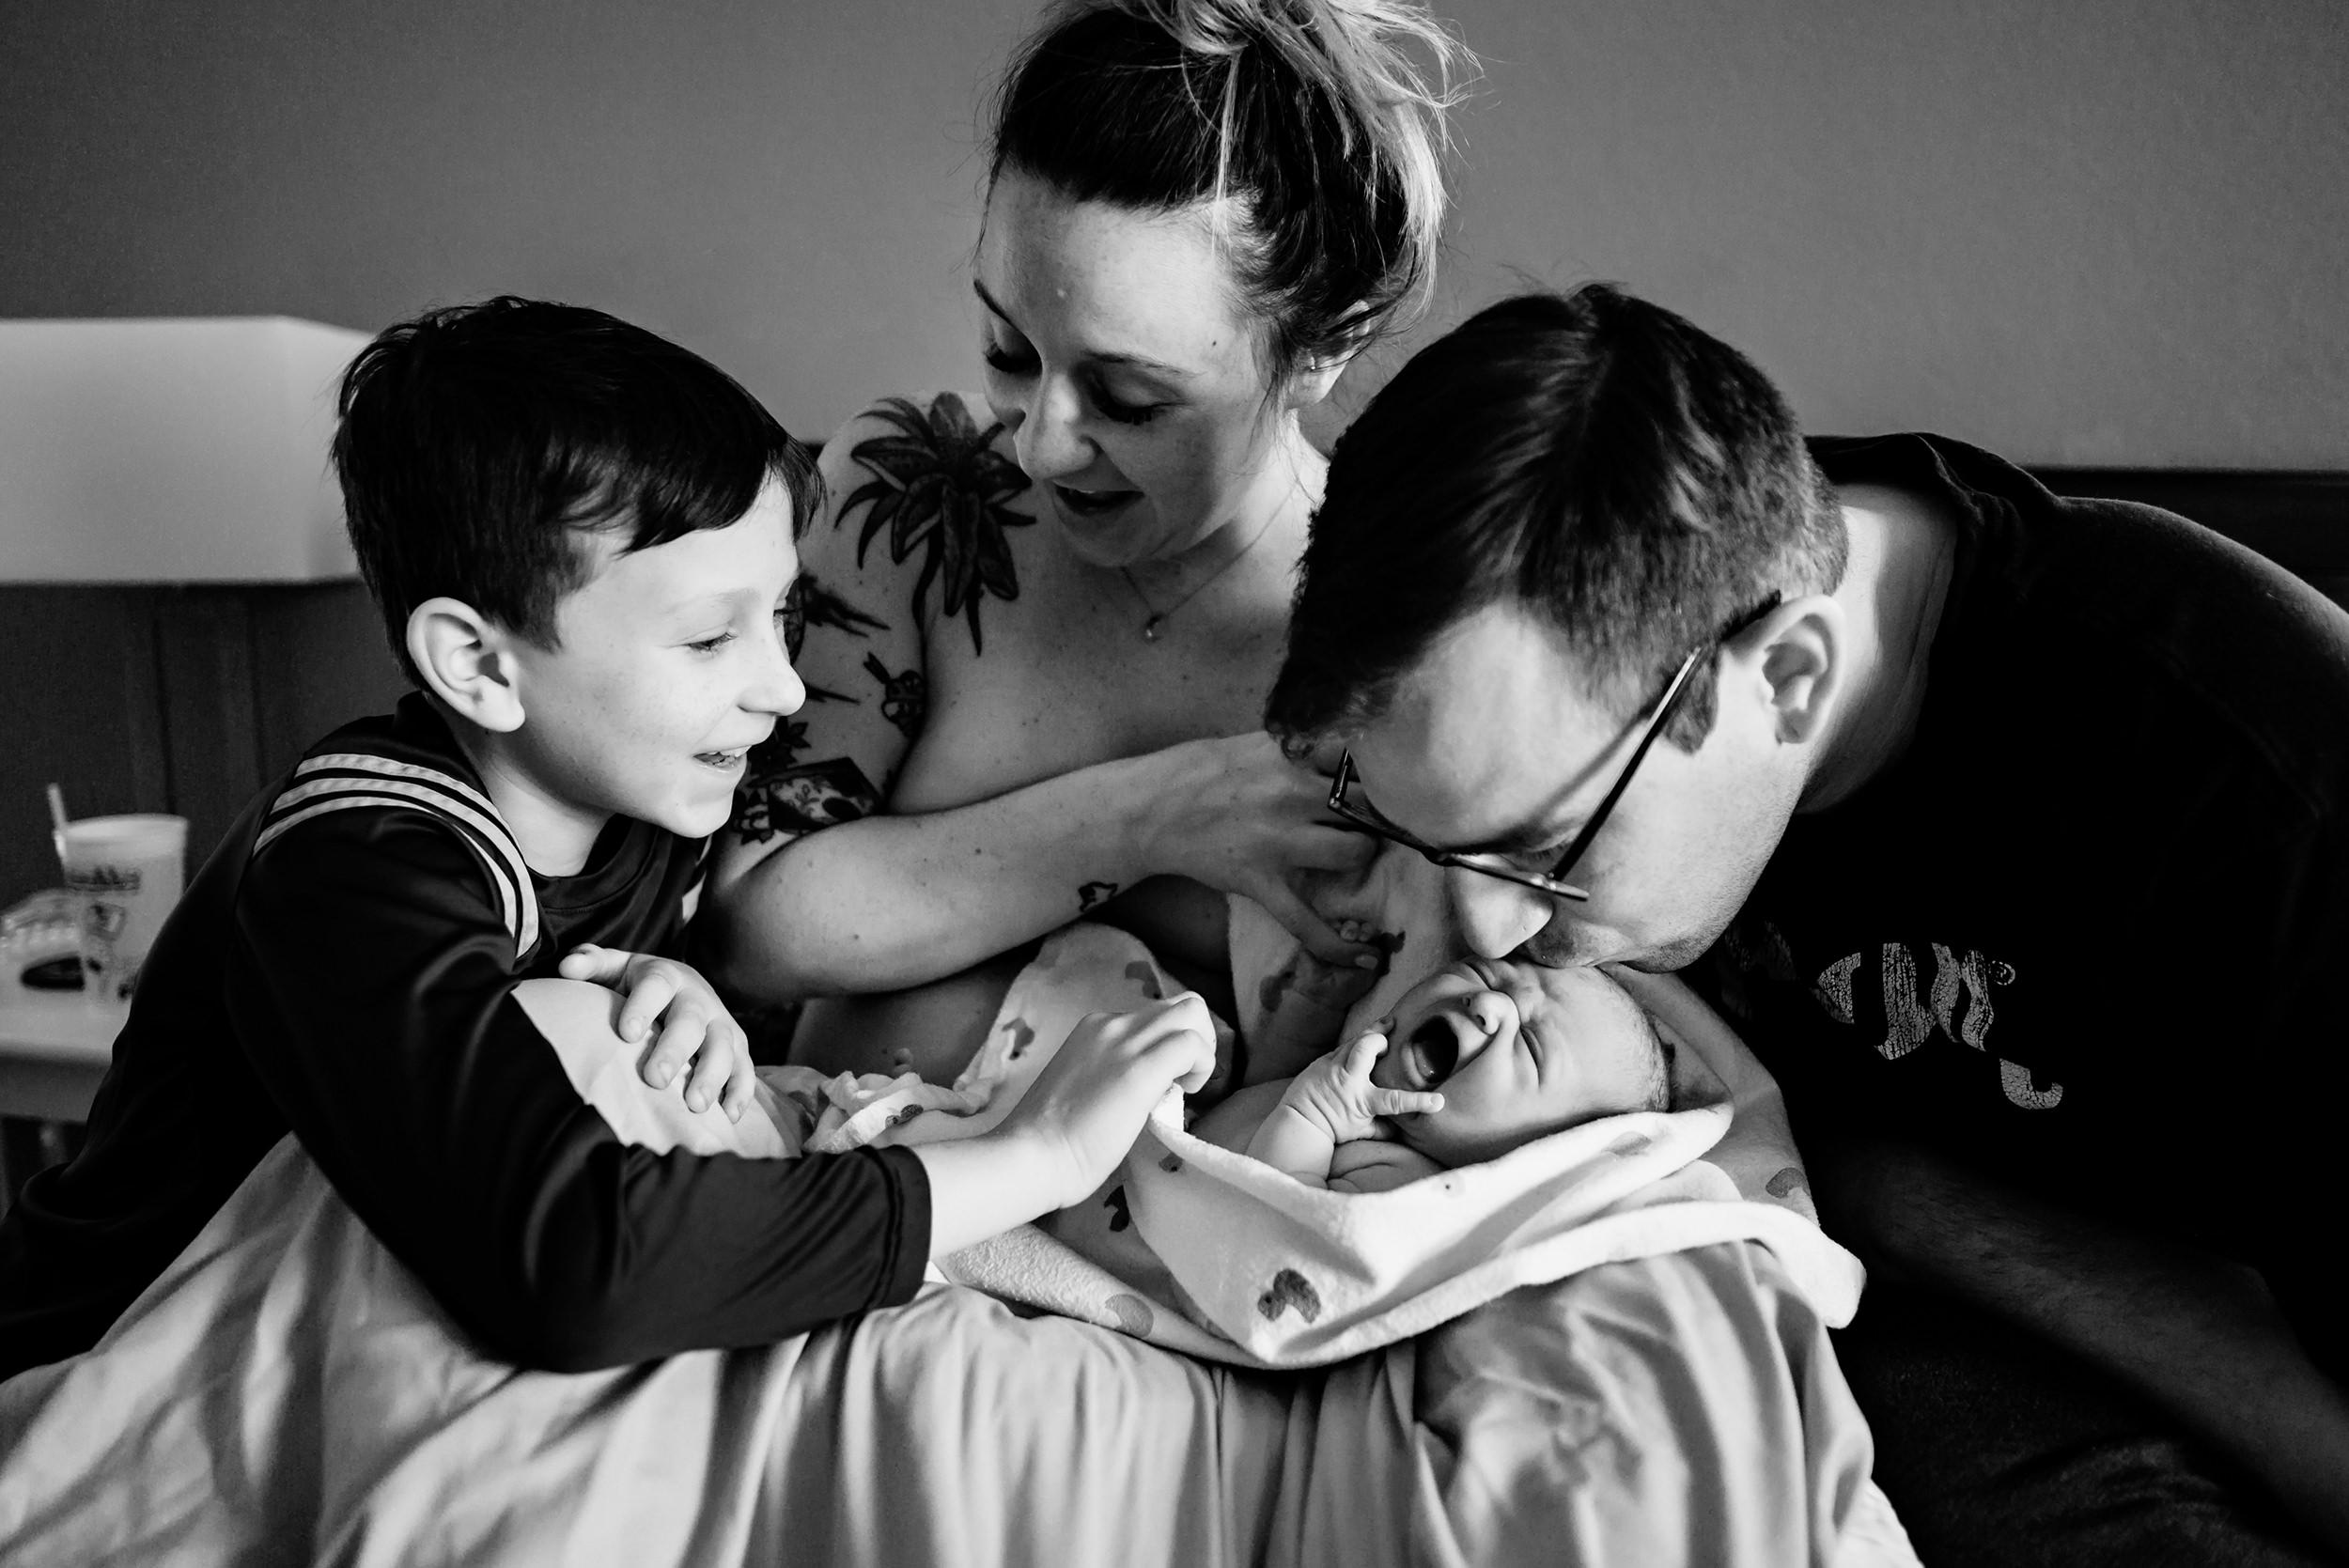 6 homebirth postpartum family scene siblings meeting.jpg